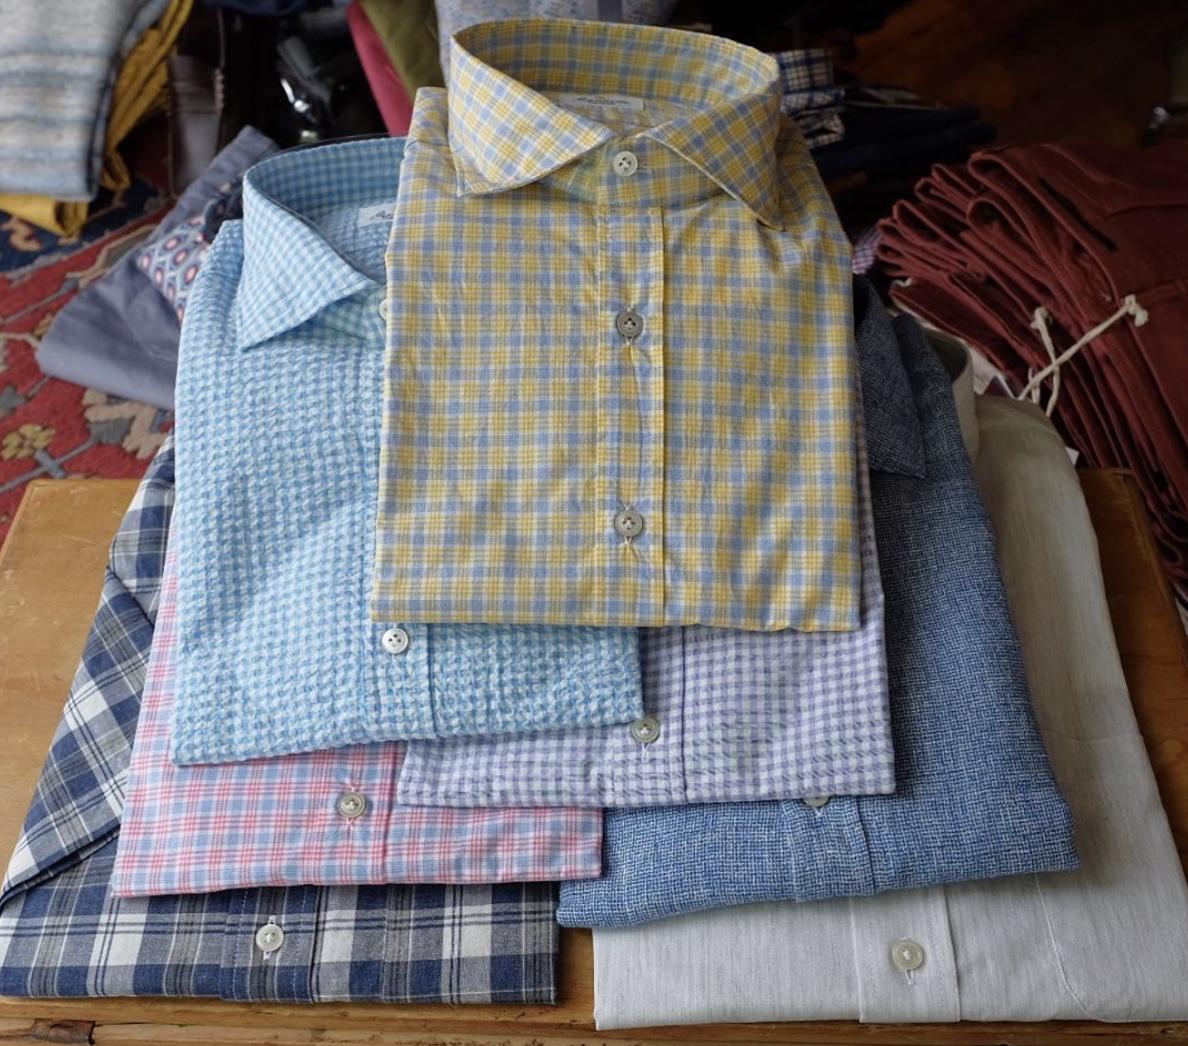 Giannetto Portofino Shirt Collection